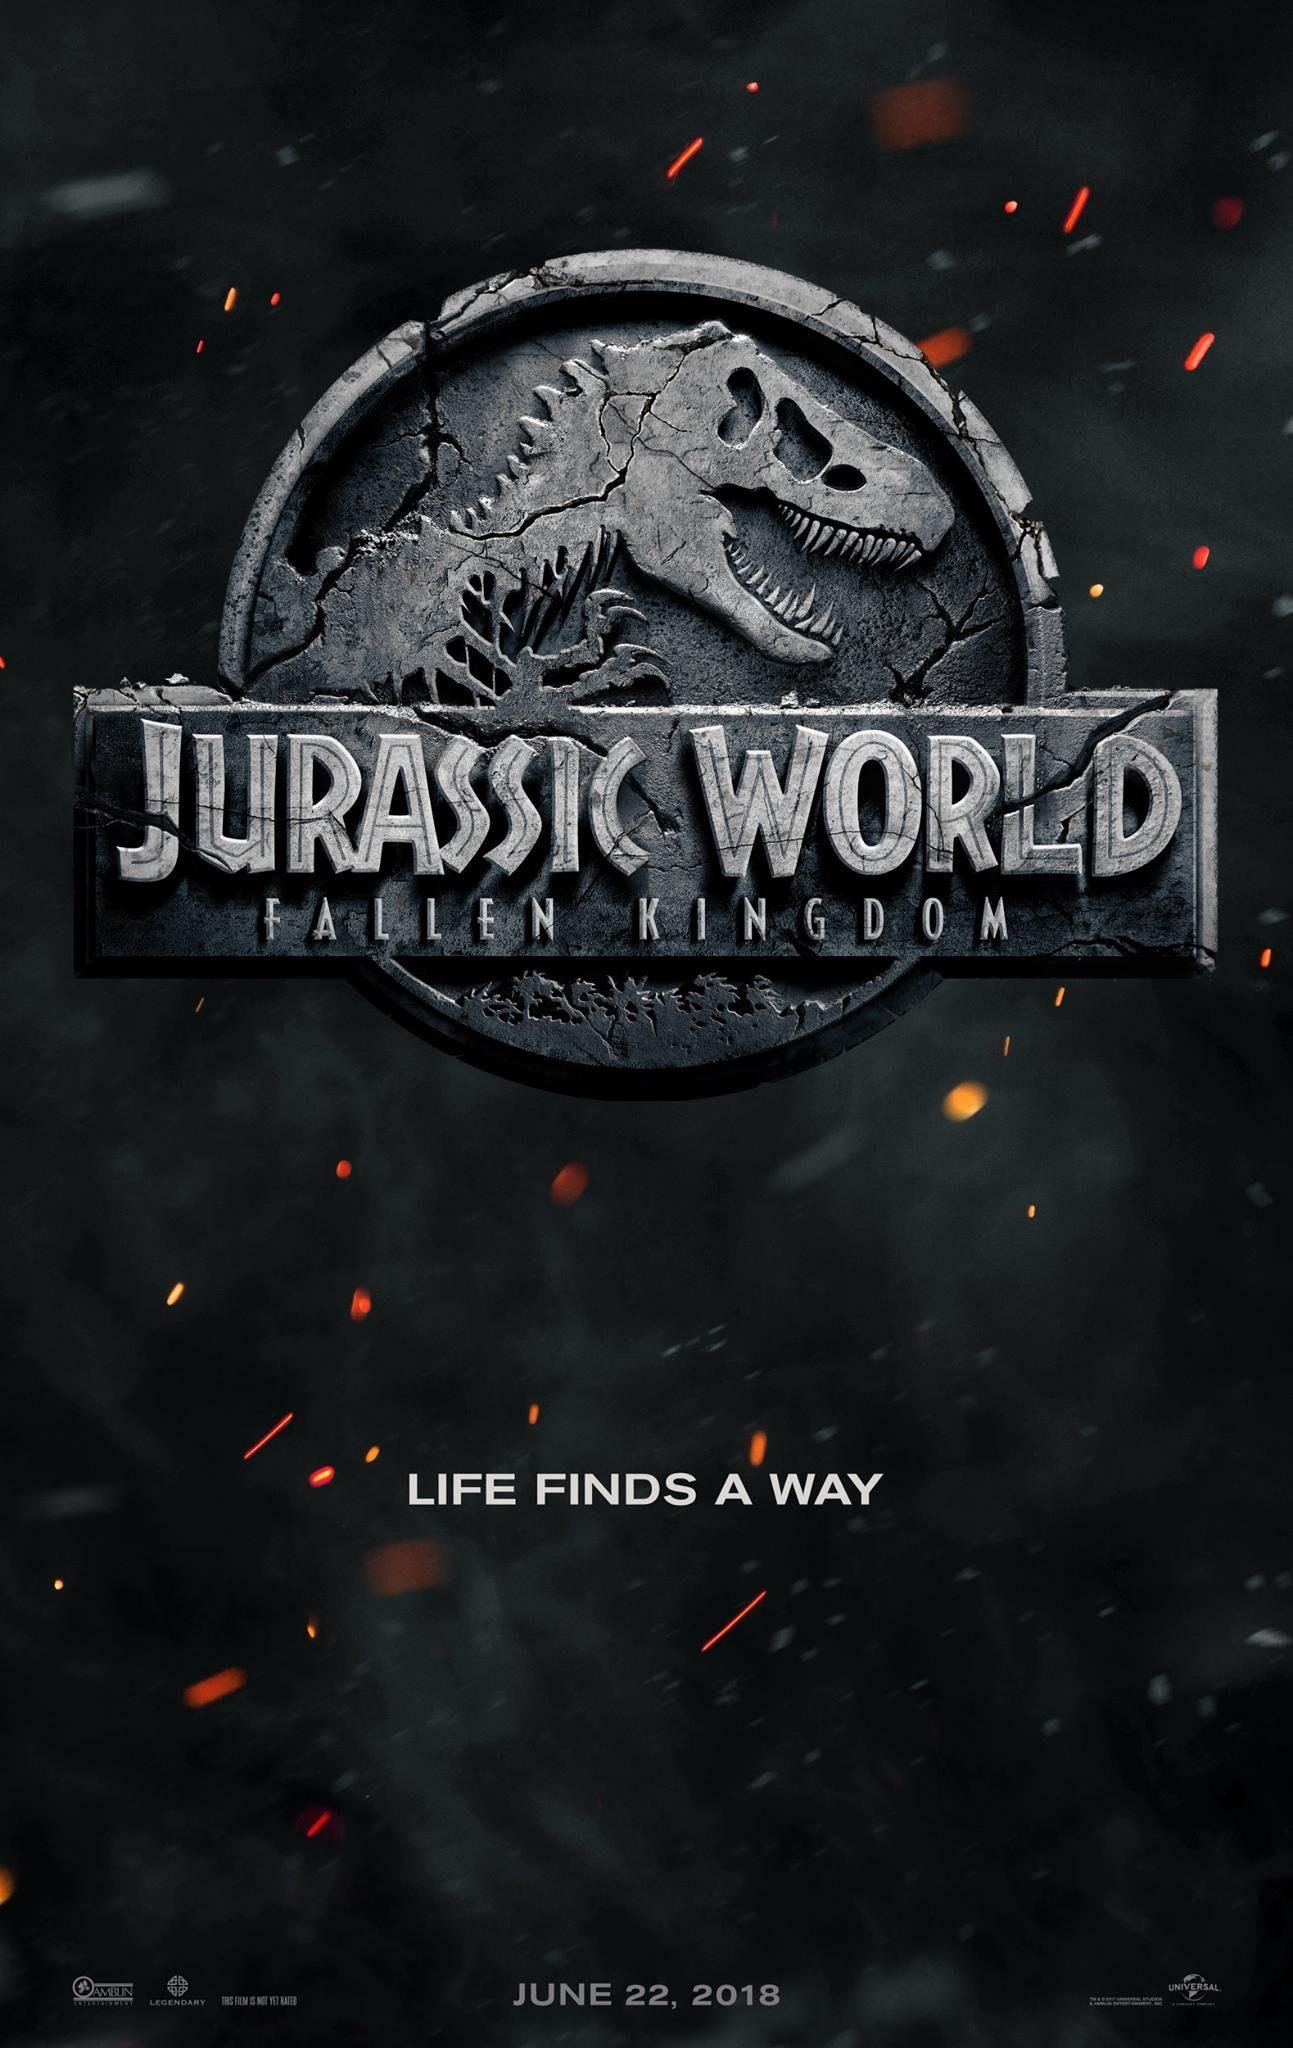 Return To The Main Poster Page For Jurassic World Fallen Kingdom Jurassic World Movie Falling Kingdoms Jurassic World Fallen Kingdom